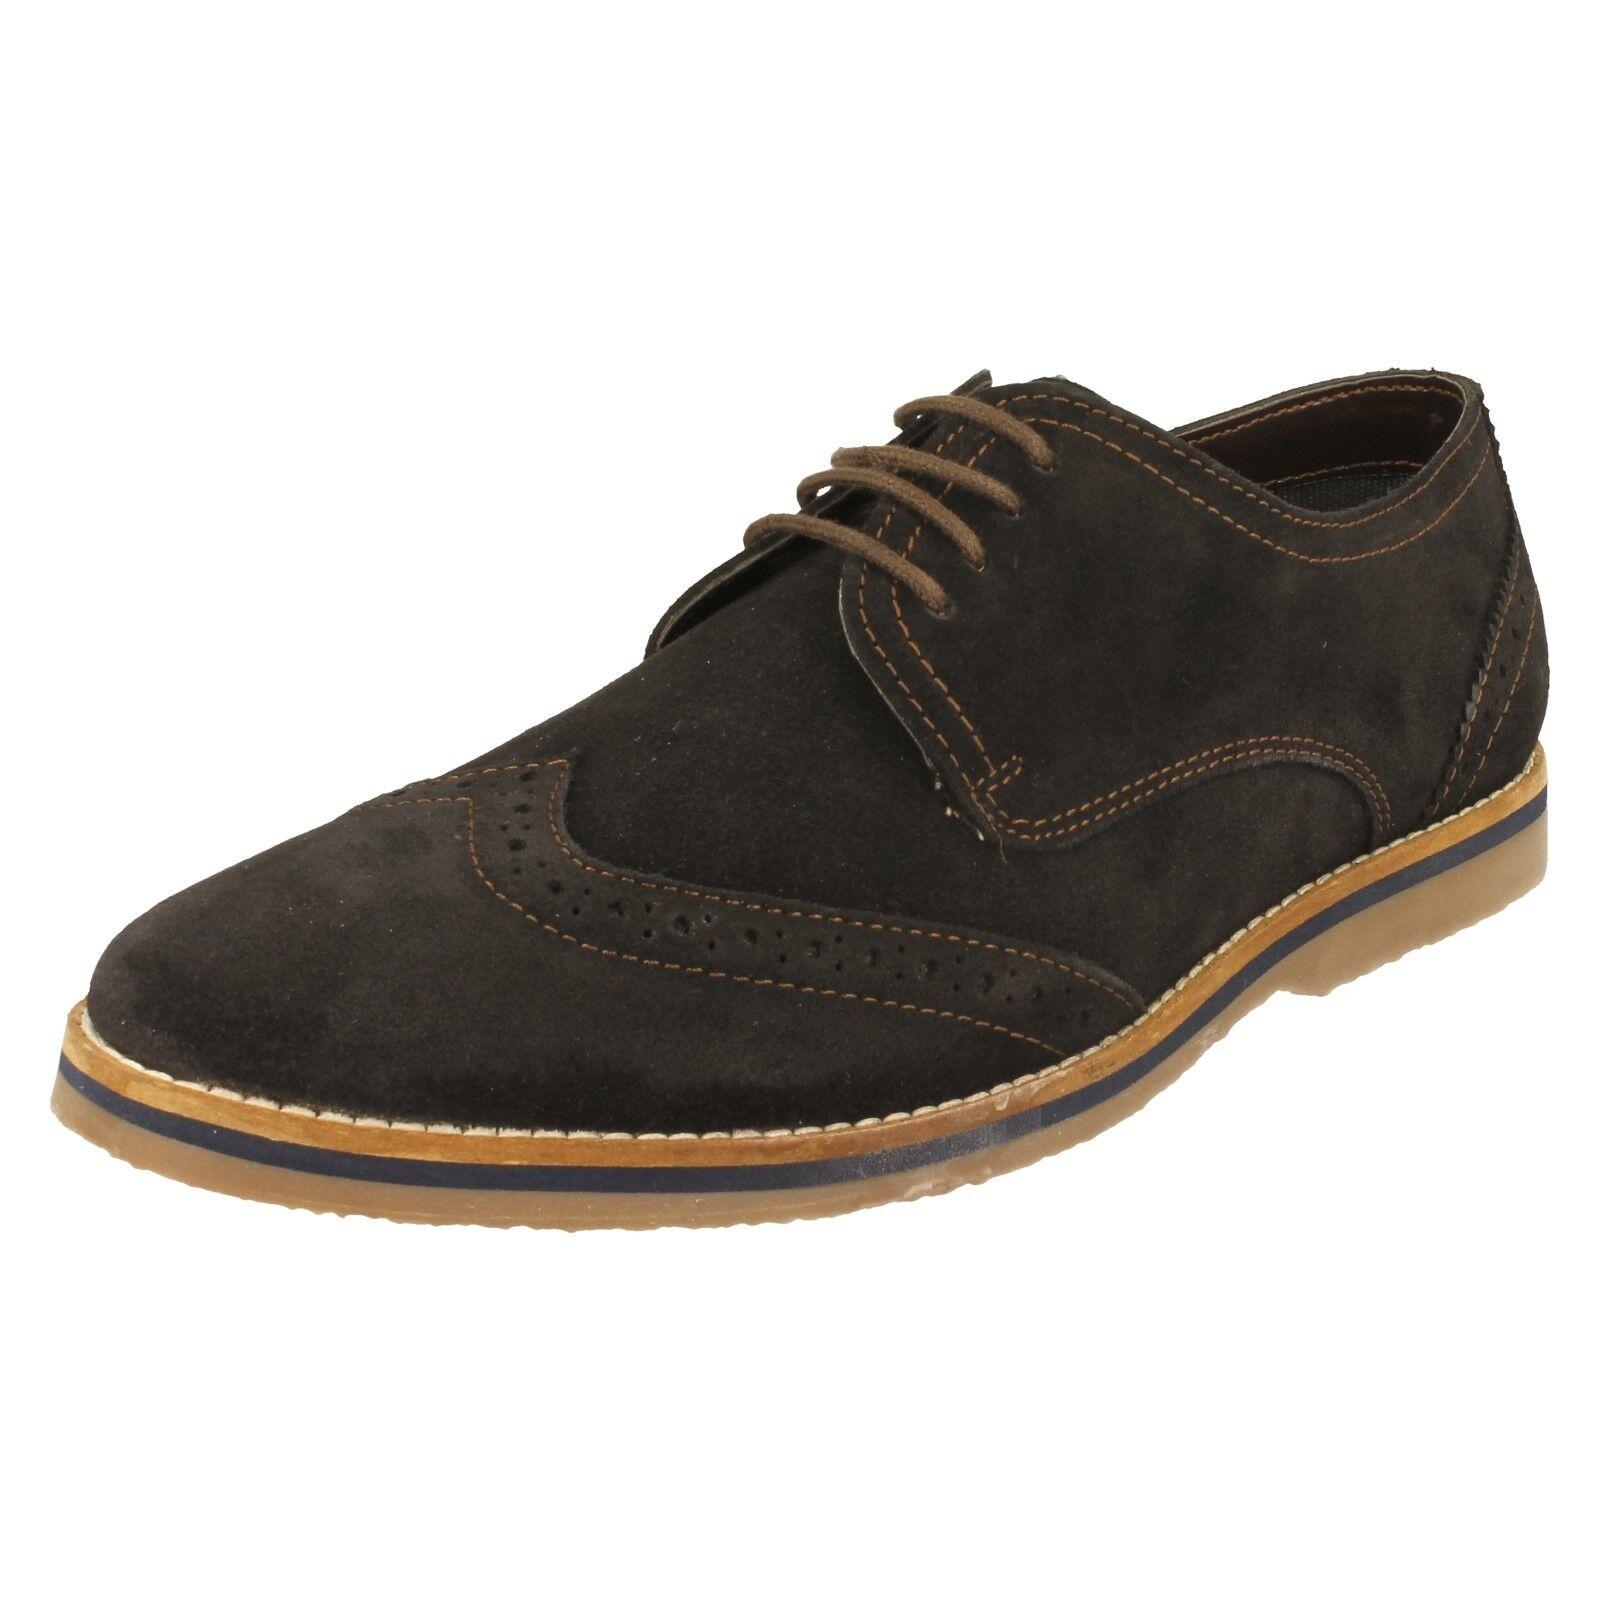 Scarpe casual da uomo Uomo Hush Puppies Semi CALATA Suede Shoes-Sebastian all'inglese